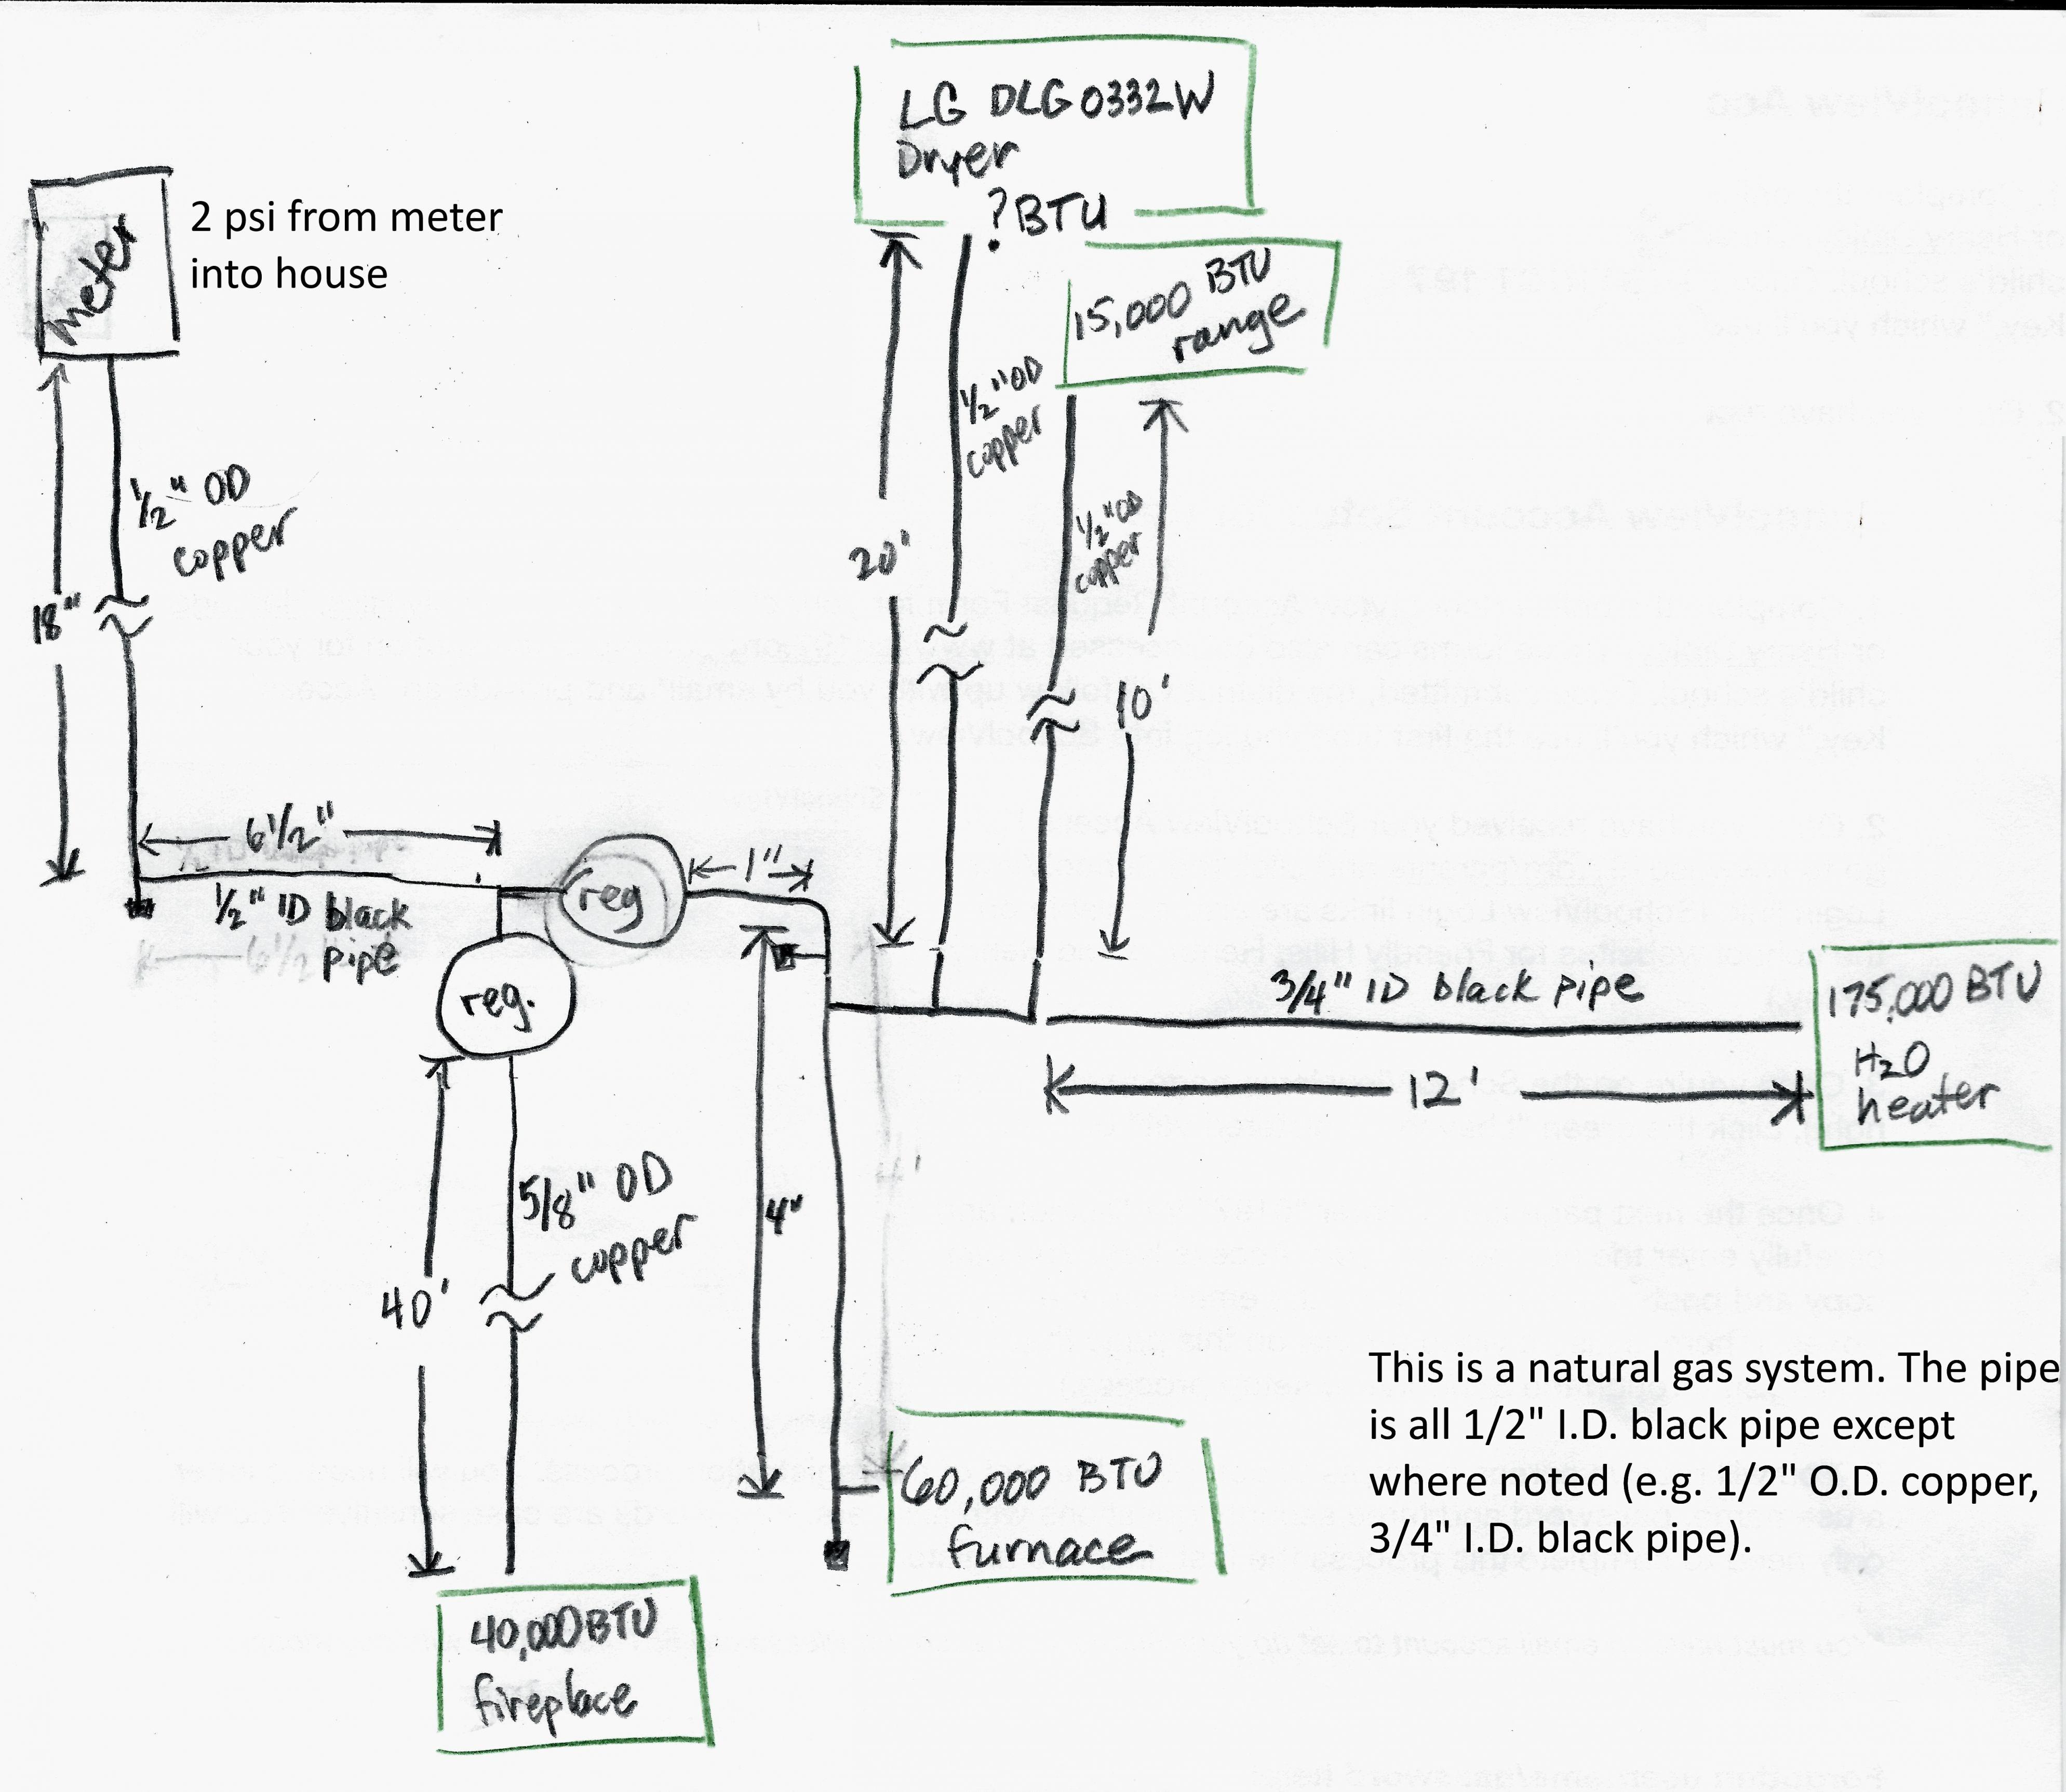 1991 Honda Accord Engine Diagram 99 Civic Fog Light Wiring Diagram Mikulskilawoffices Of 1991 Honda Accord Engine Diagram